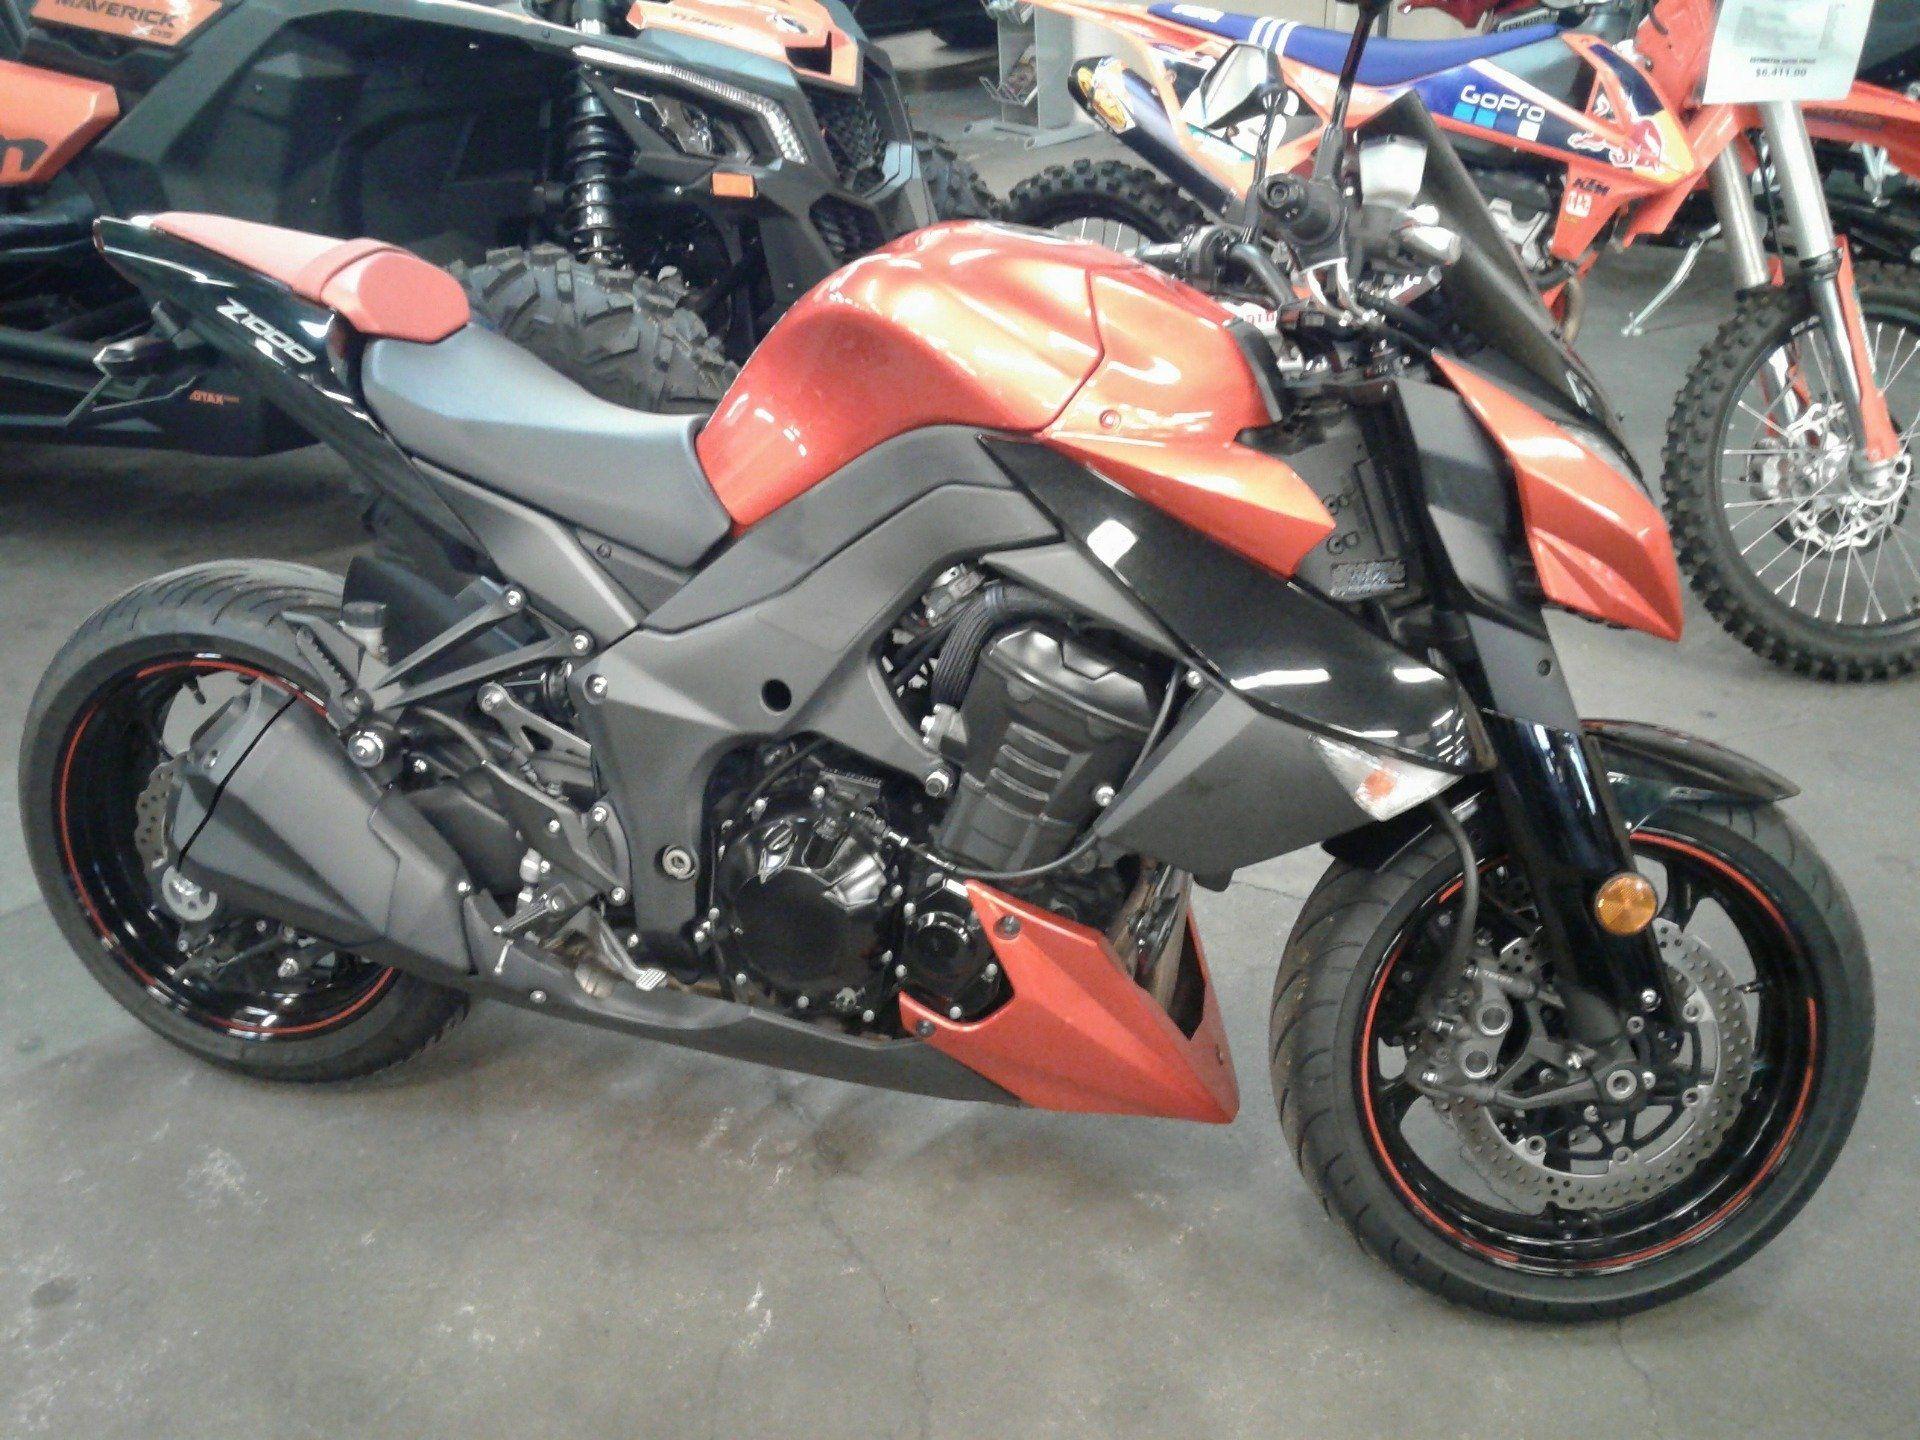 Used 2012 Kawasaki Z1000 Motorcycles In Bakersfield Ca Stock